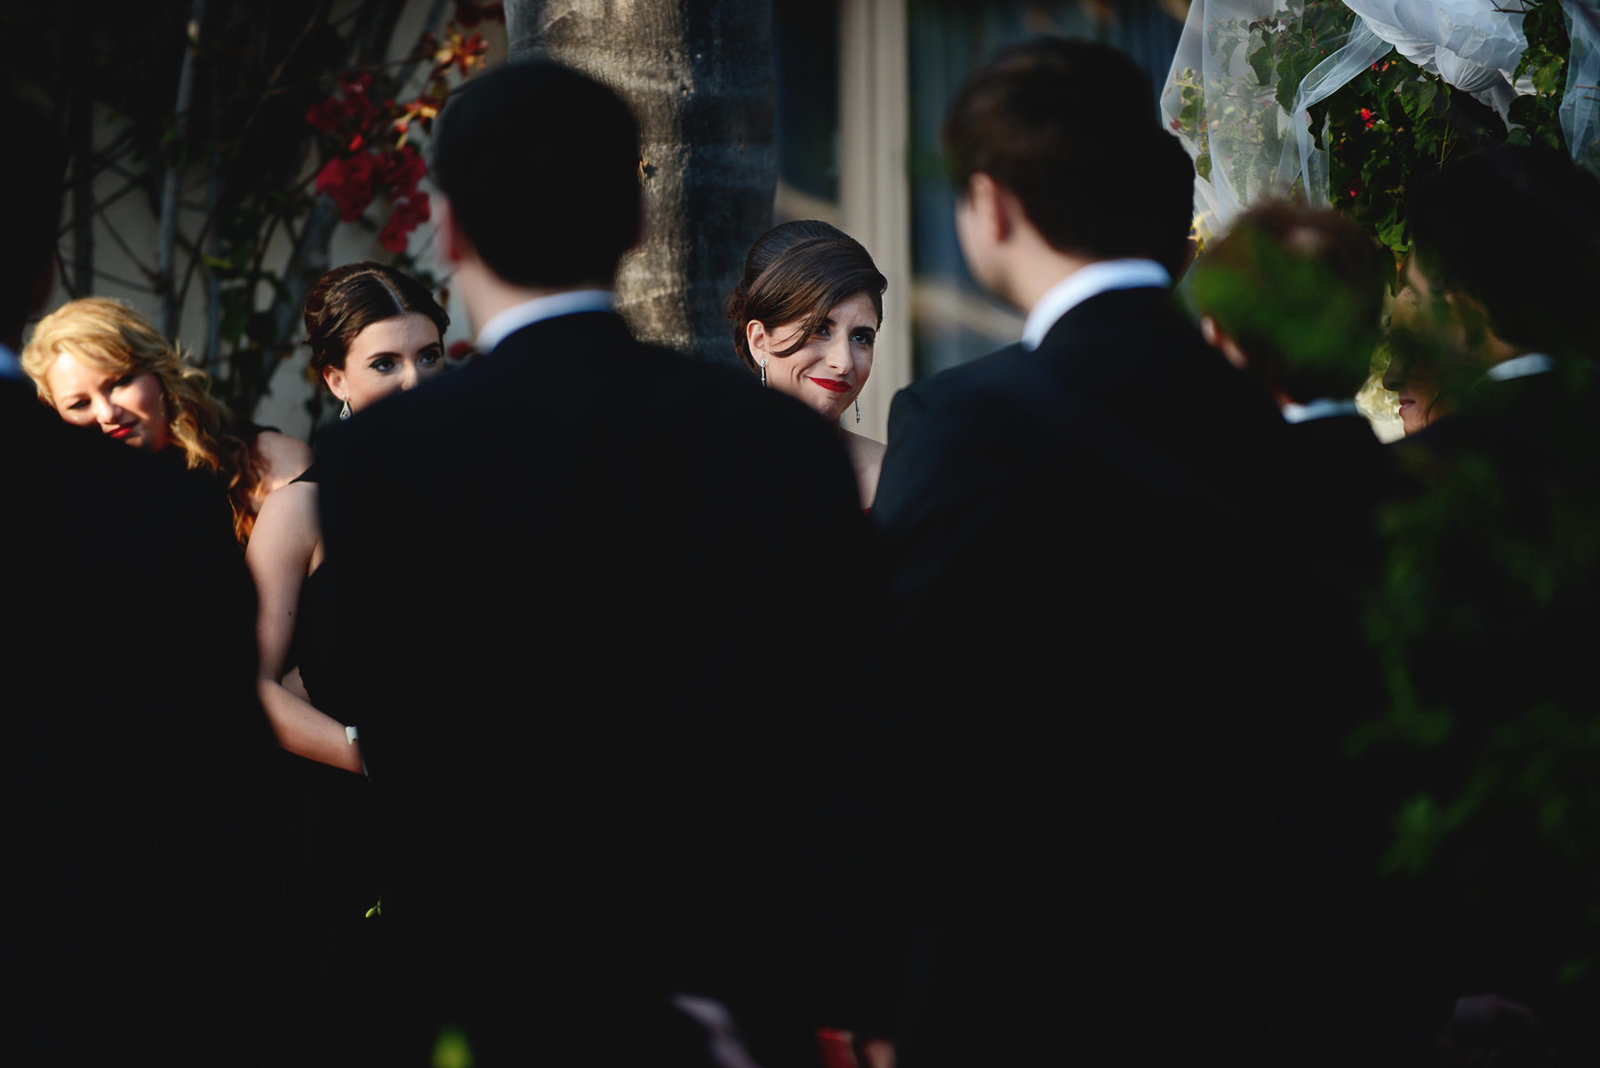 malibu wedding photographer photos celebrity wedding photographer bryan newfield photography ruth mike 17